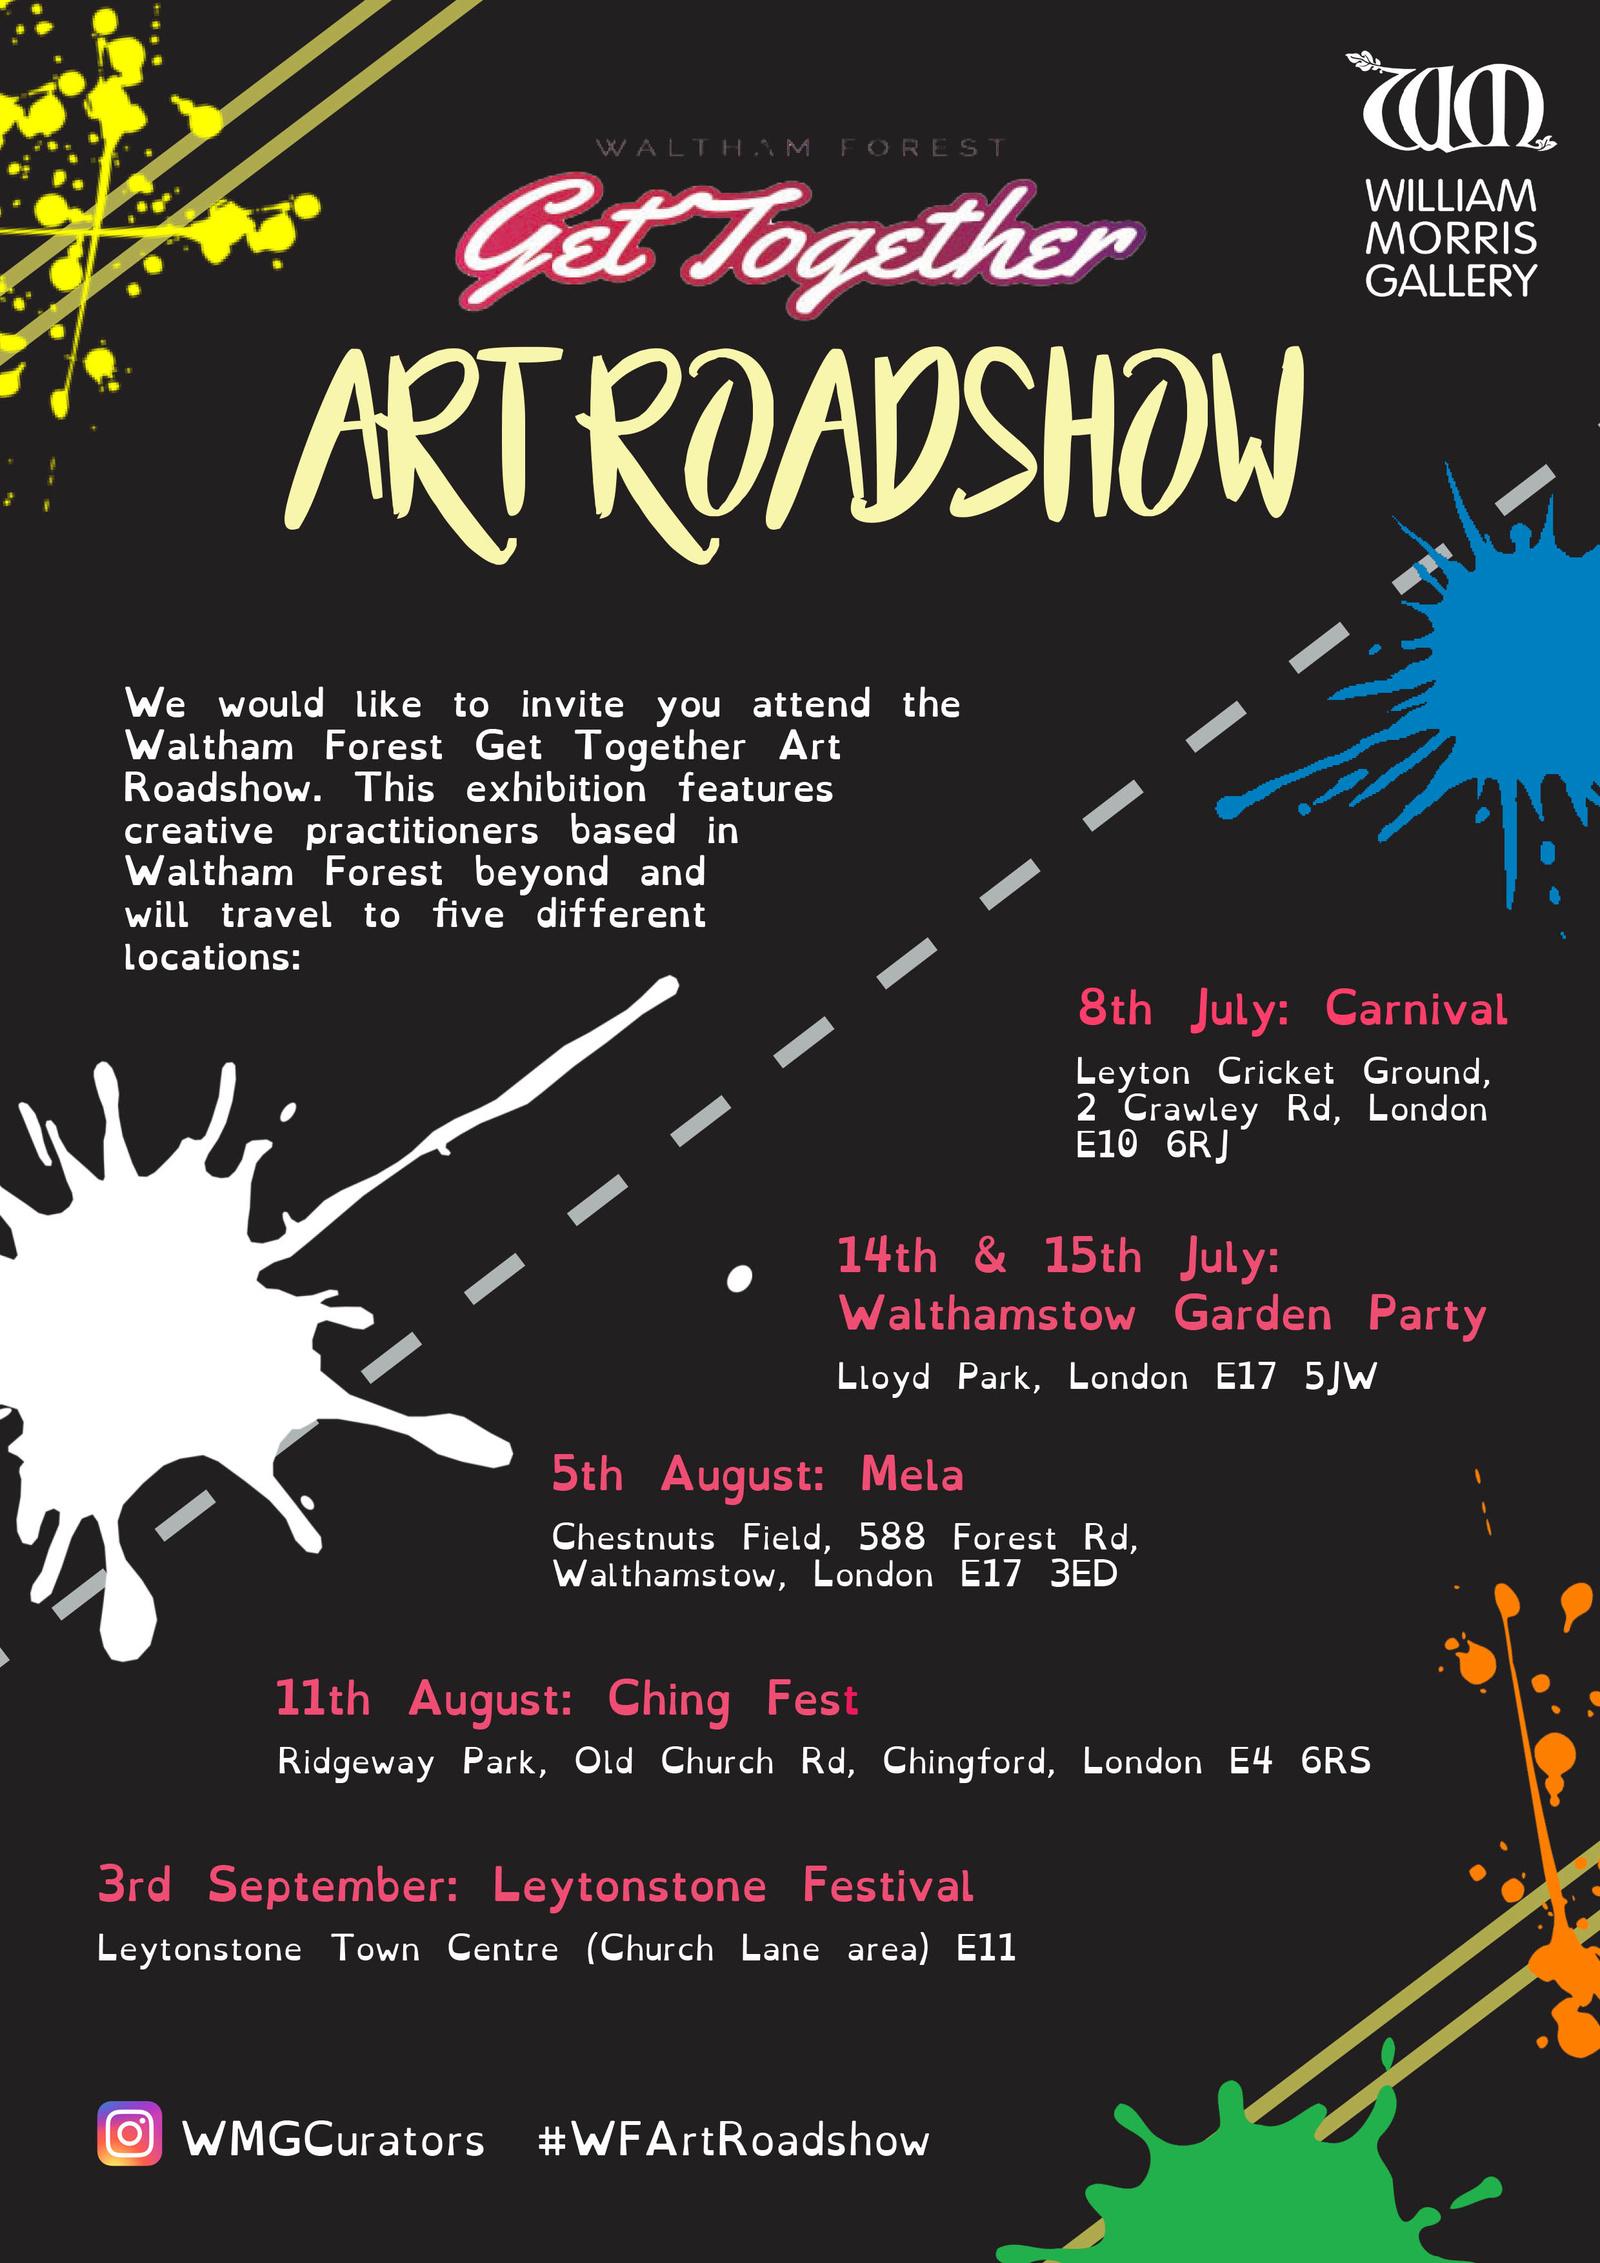 Get Together Art Roadshow